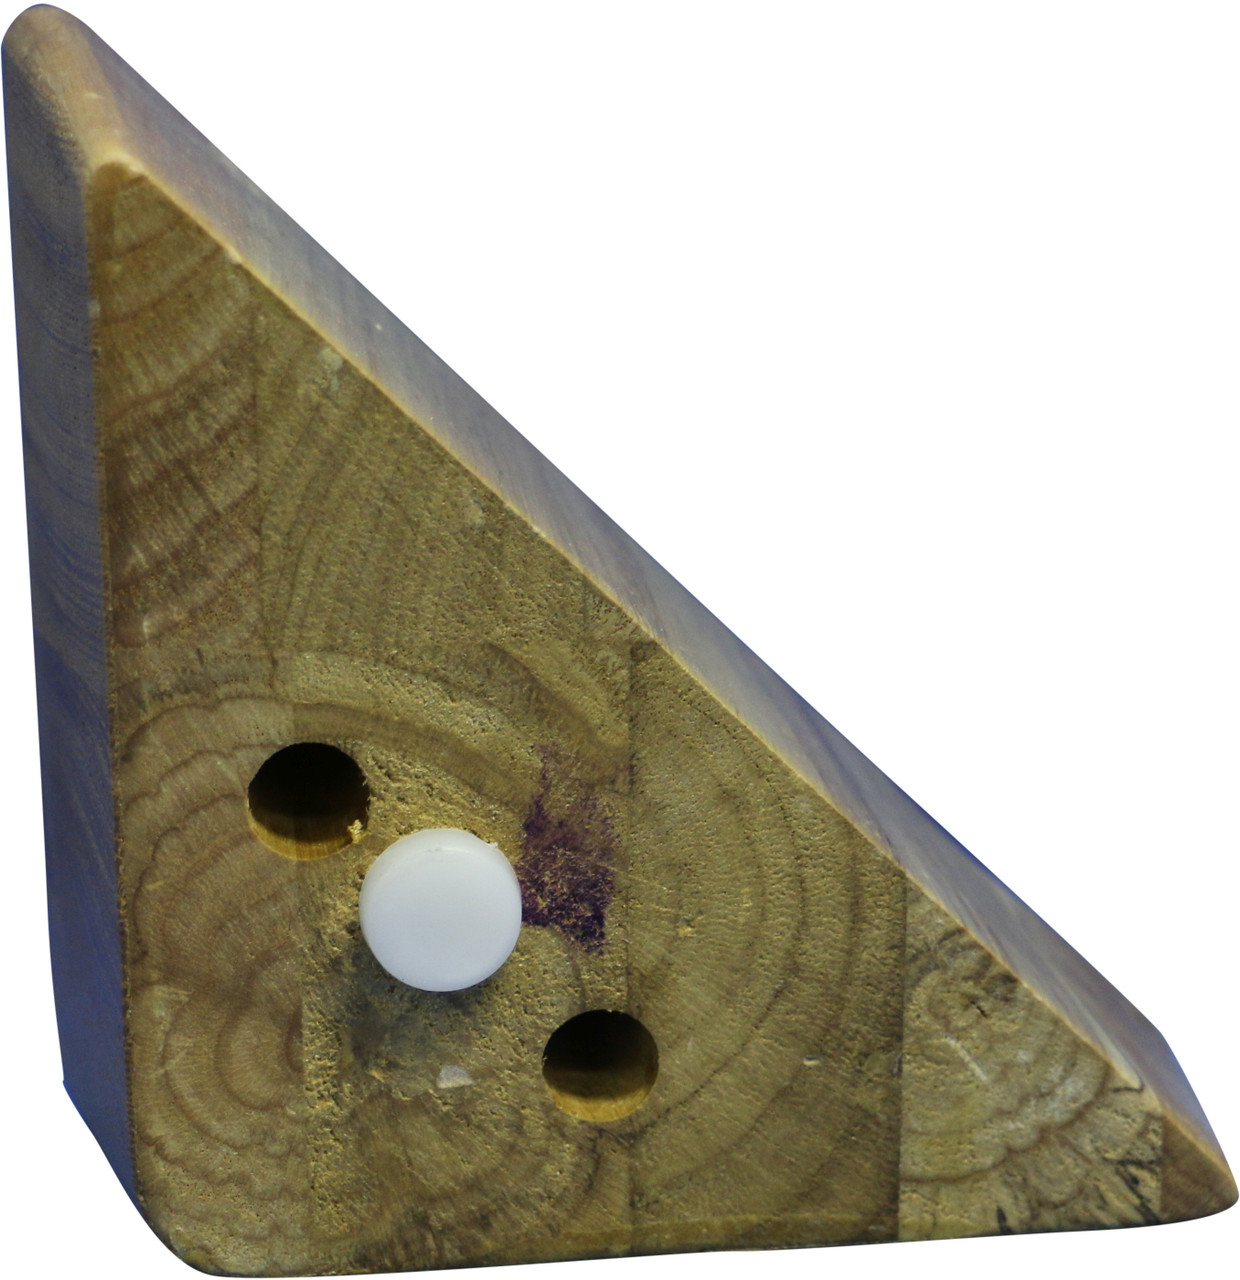 Swell Replacement Furniture Leg Triangular 3 Oak Set Of 4 Natural Oak Pdpeps Interior Chair Design Pdpepsorg